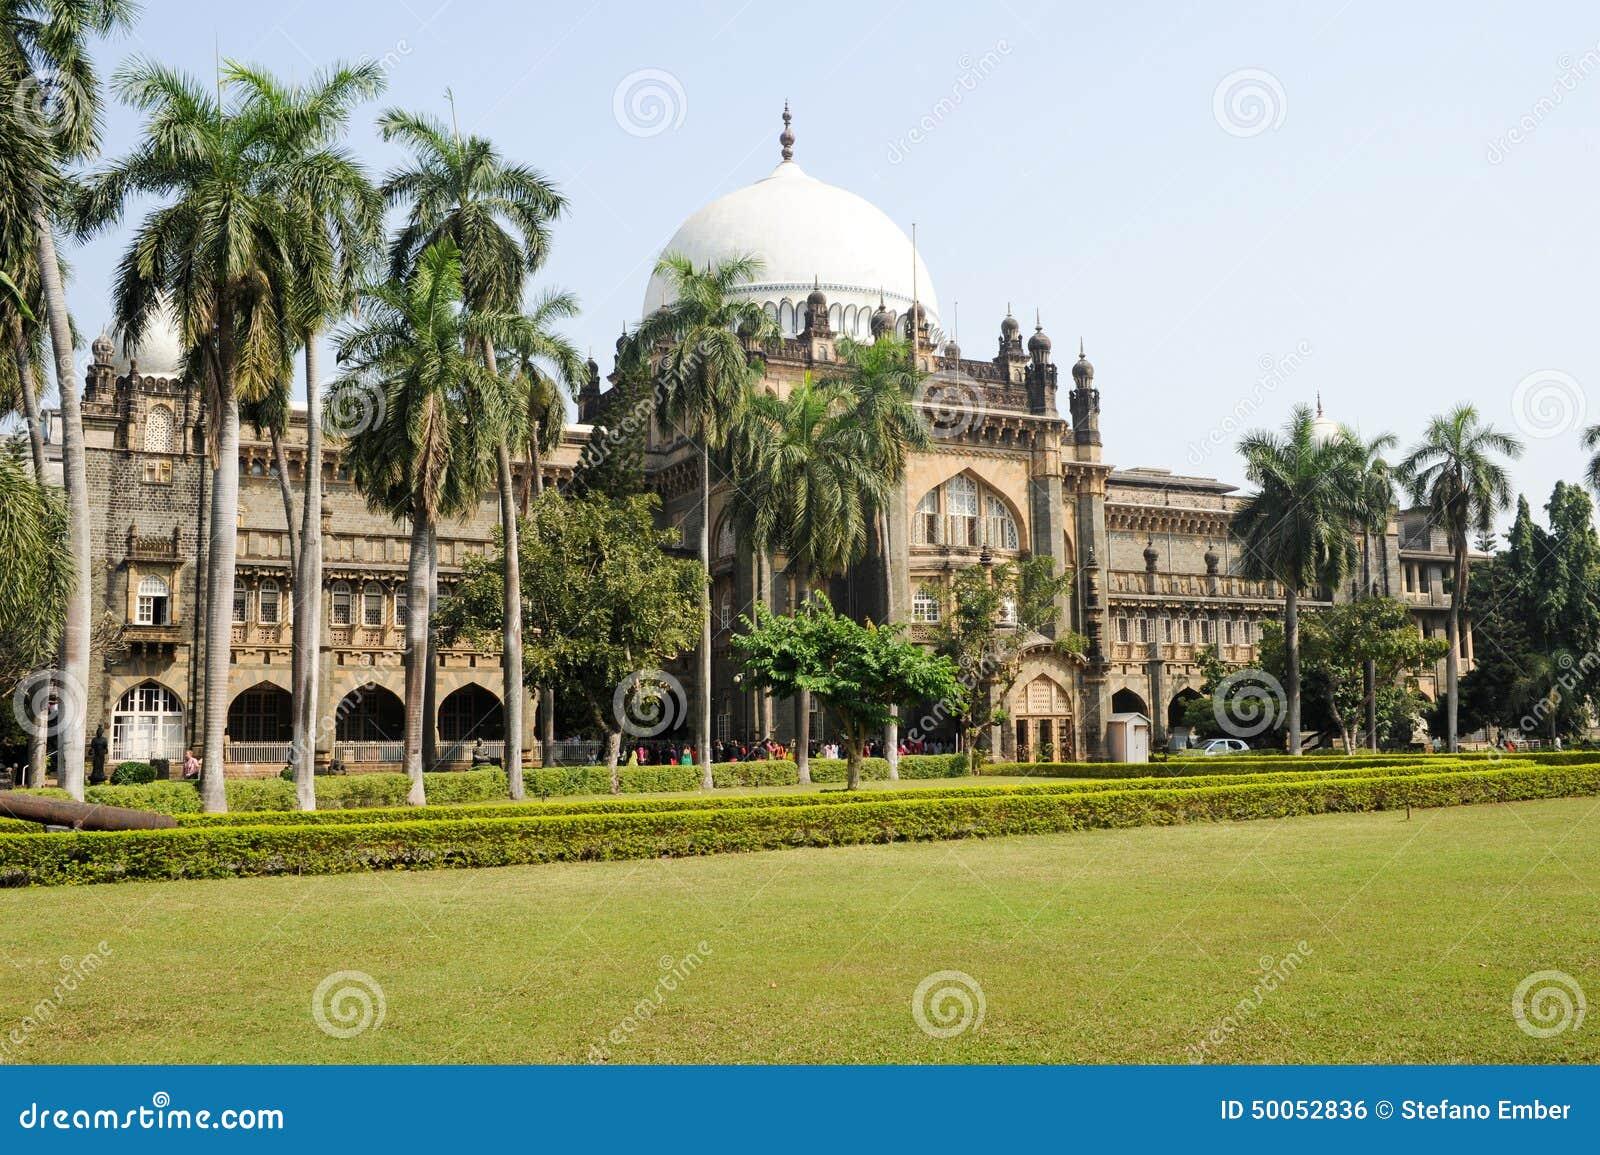 Prinz von Wales-Museum in Mumbai